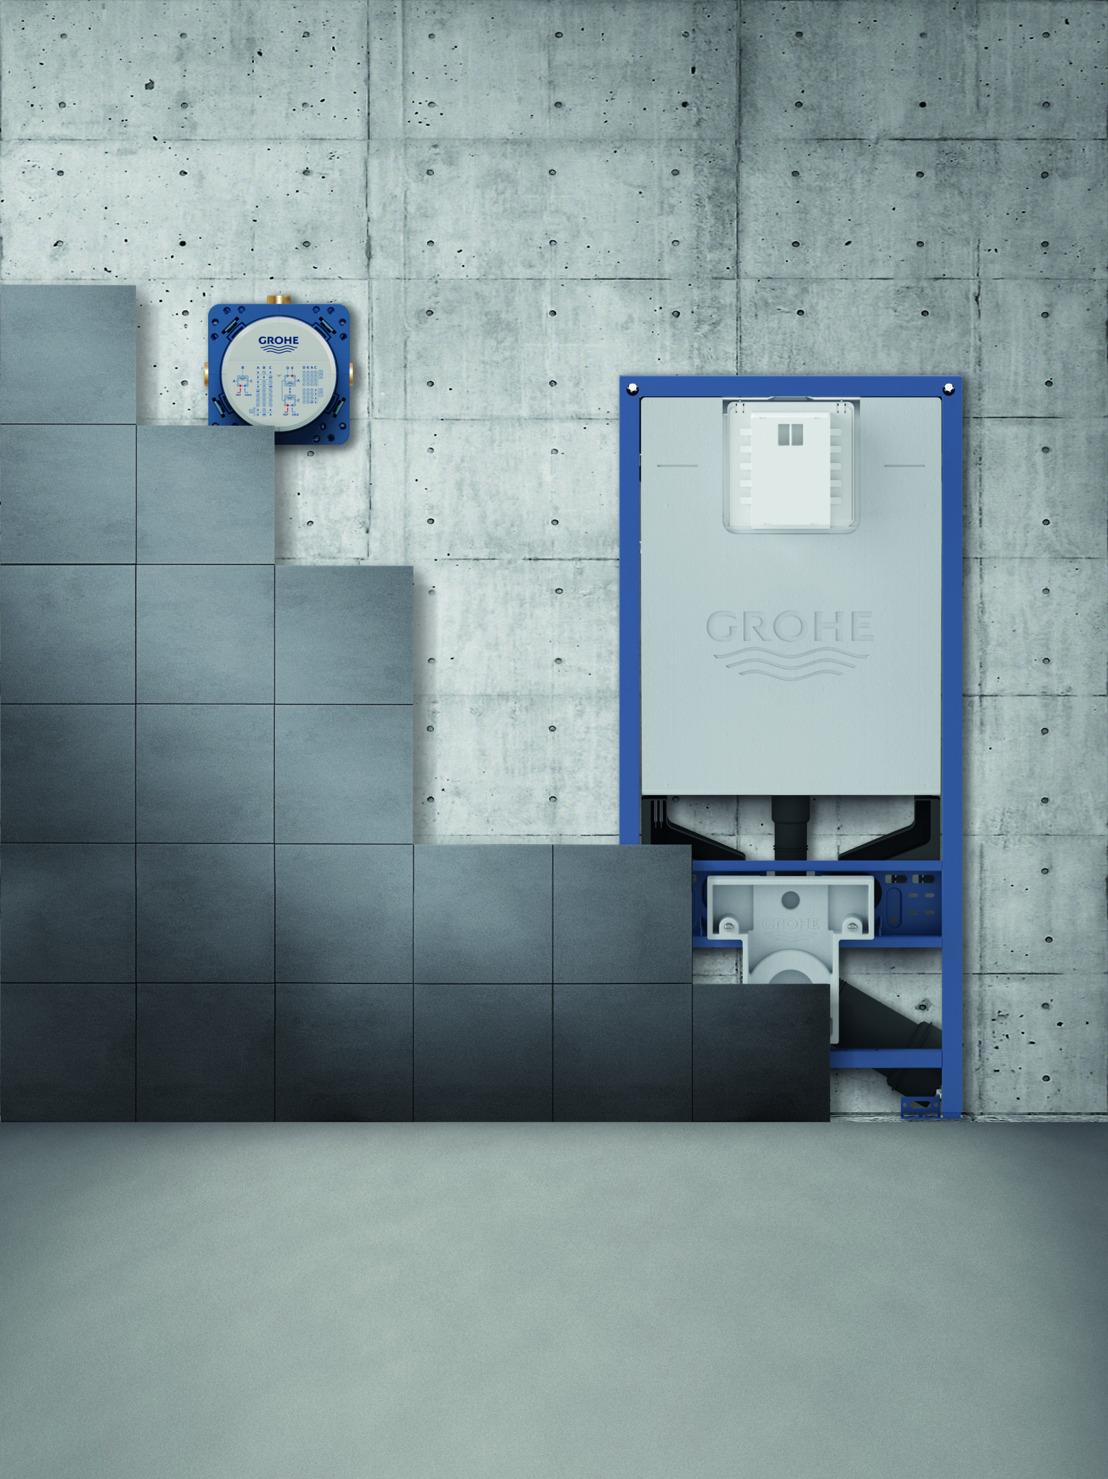 GROHE Slim Cistern inbouwreservoirs, dé WC-oplossing voor compacte badkamers